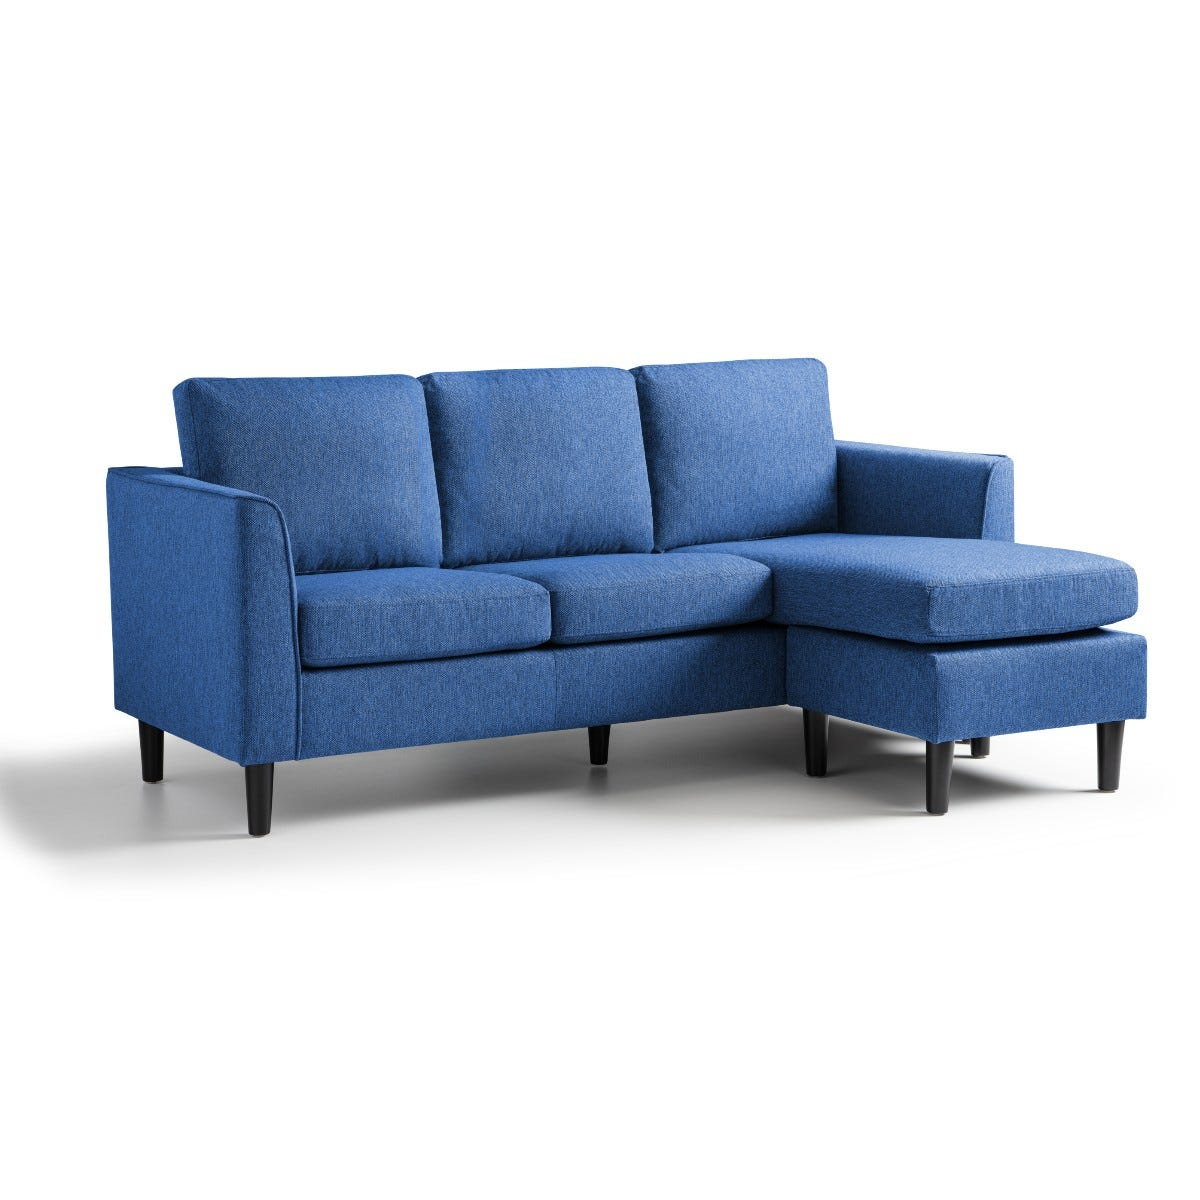 Kara Corner Chaise Sofa Tweed Blue